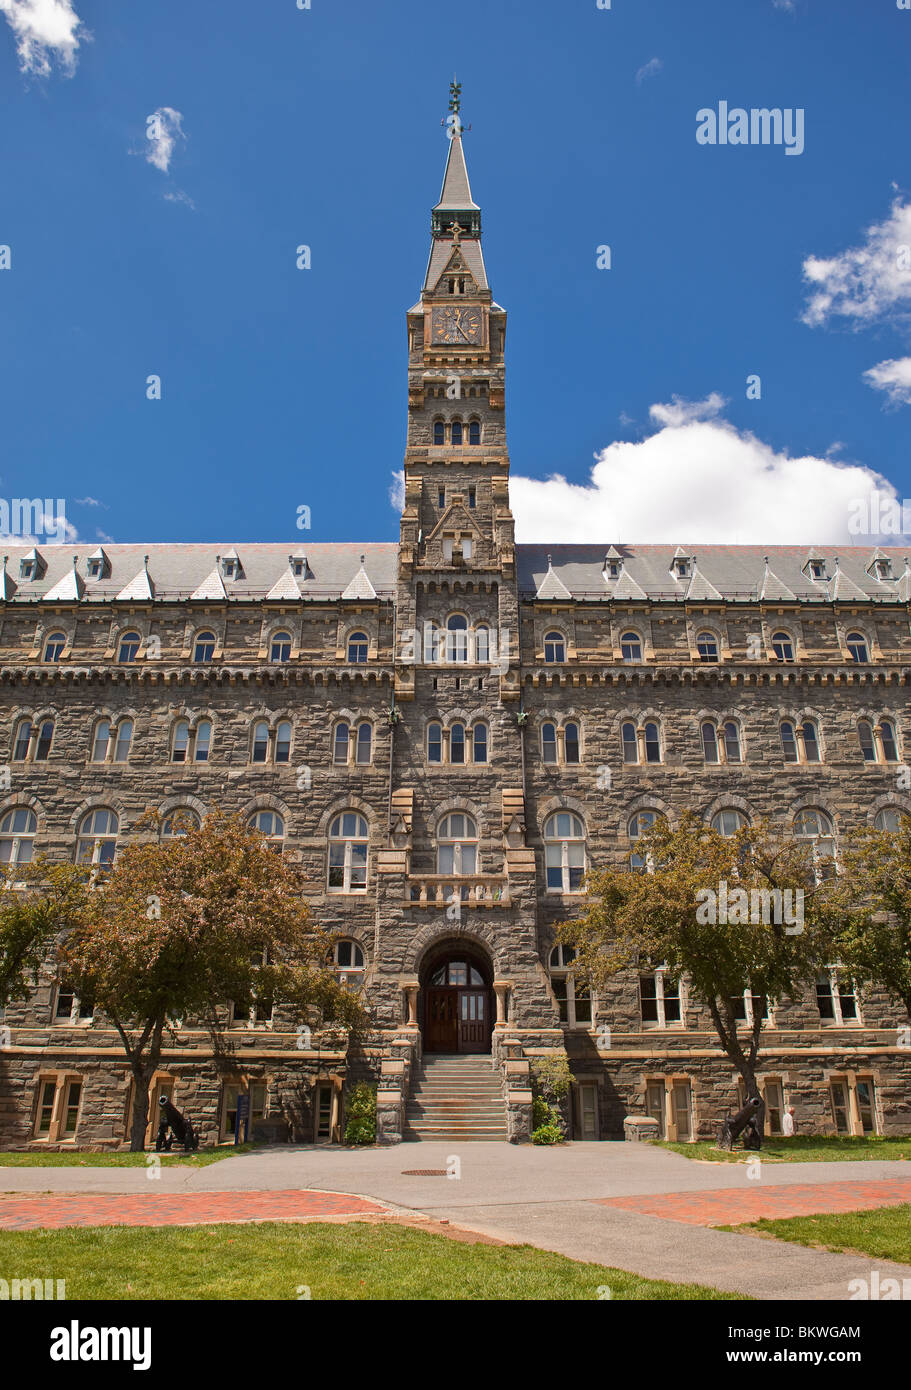 WASHINGTON, DC, USA - Healy Hall at Georgetown University. - Stock Image